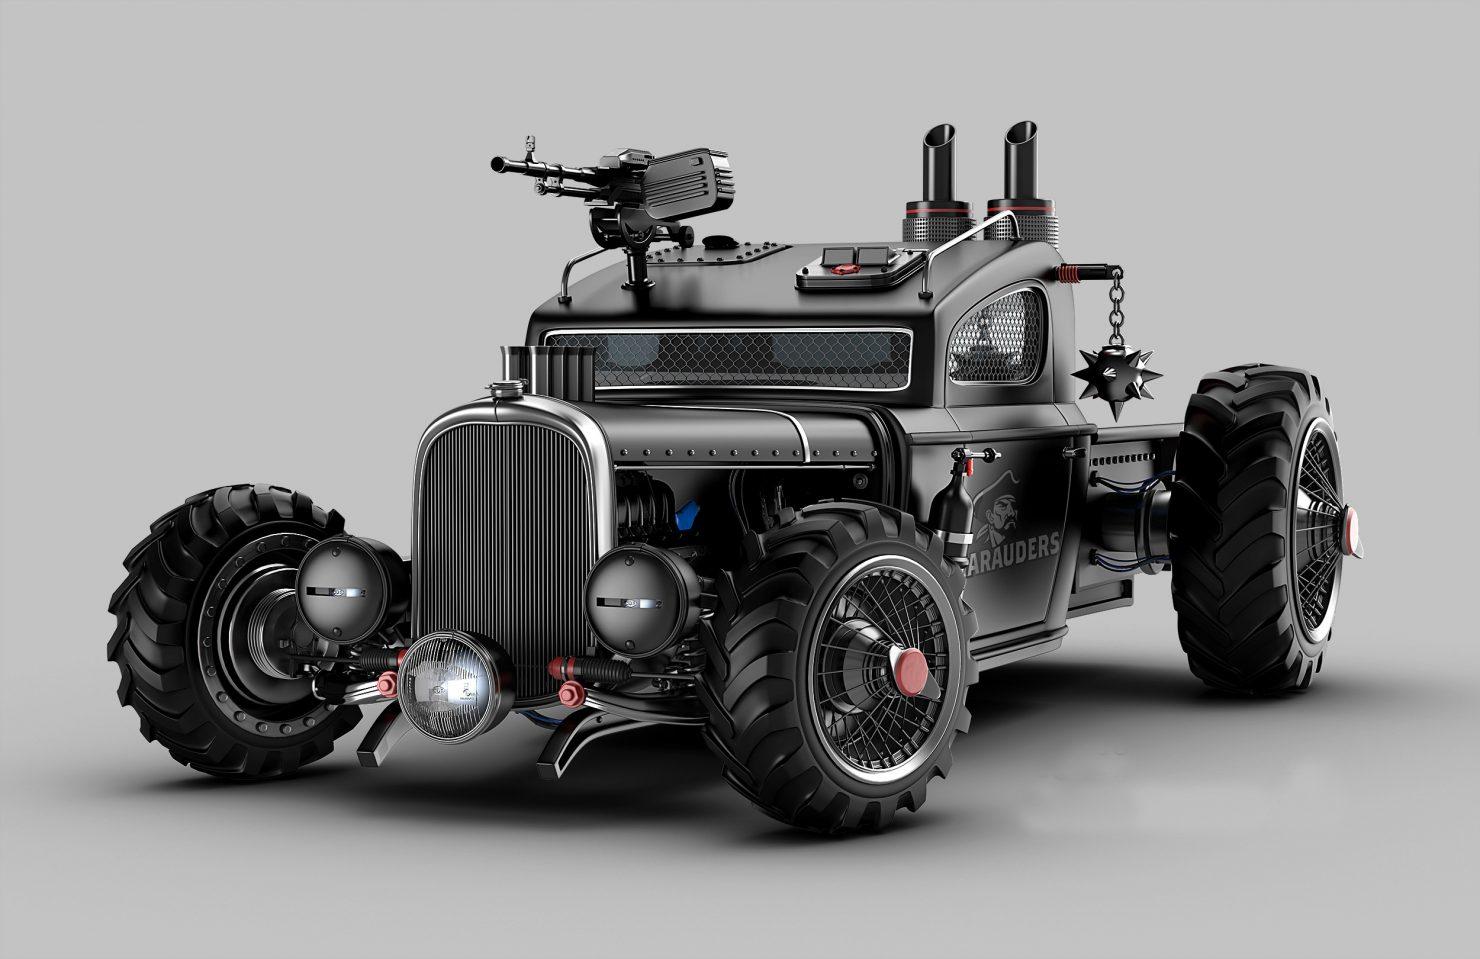 BLACK WARRIOR 1480x959 - The Vehicles of Jomar Machado